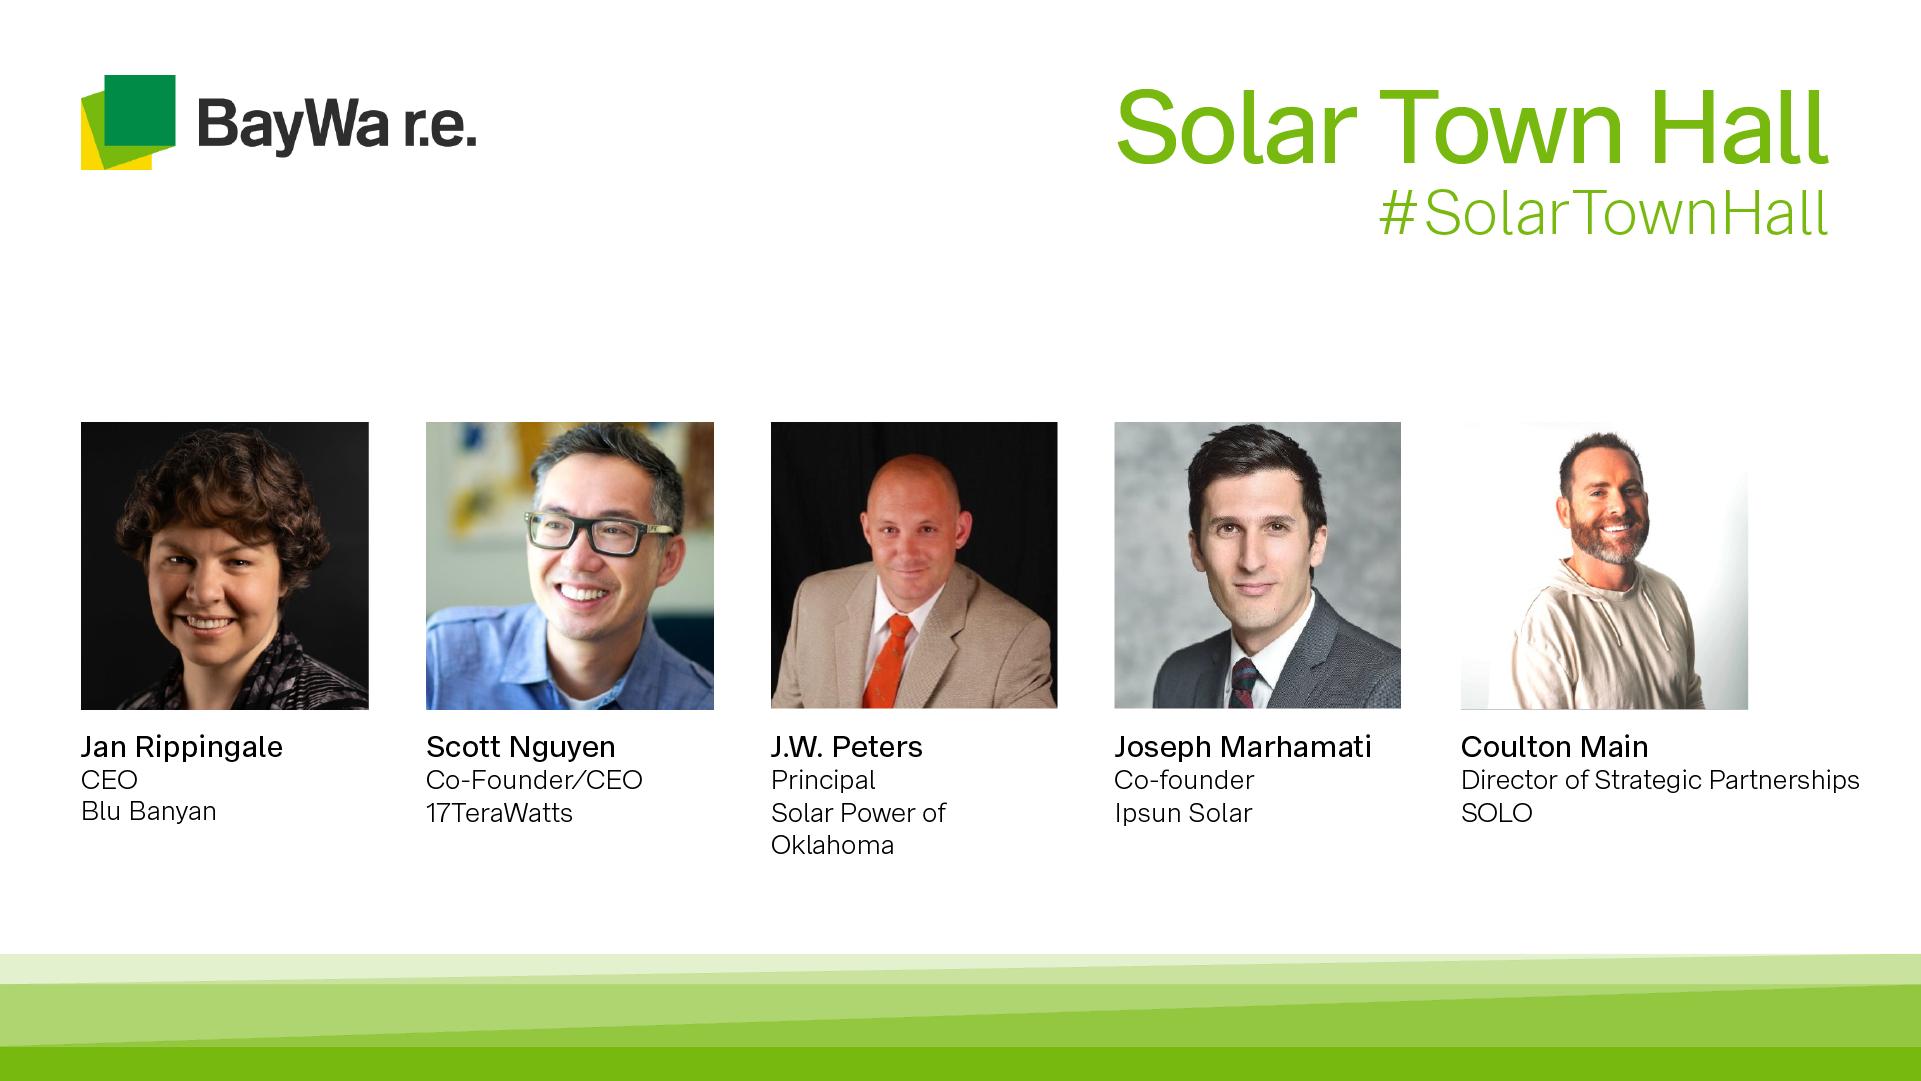 BayWa r.e. Solar Town Hall Meeting. Panelists from Blu Banyan, 17TeraWatts, Solar Power of Oklahoma, Ipsun Solar, and SOLO